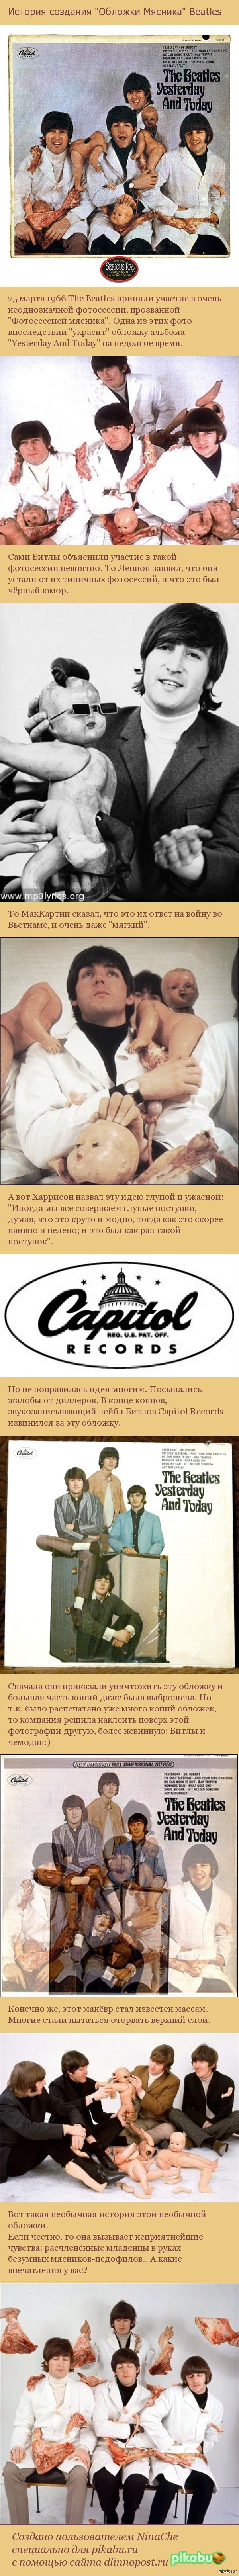 http://s6.pikabu.ru/post_img/2014/04/05/1/1396650891_1994621944.jpg